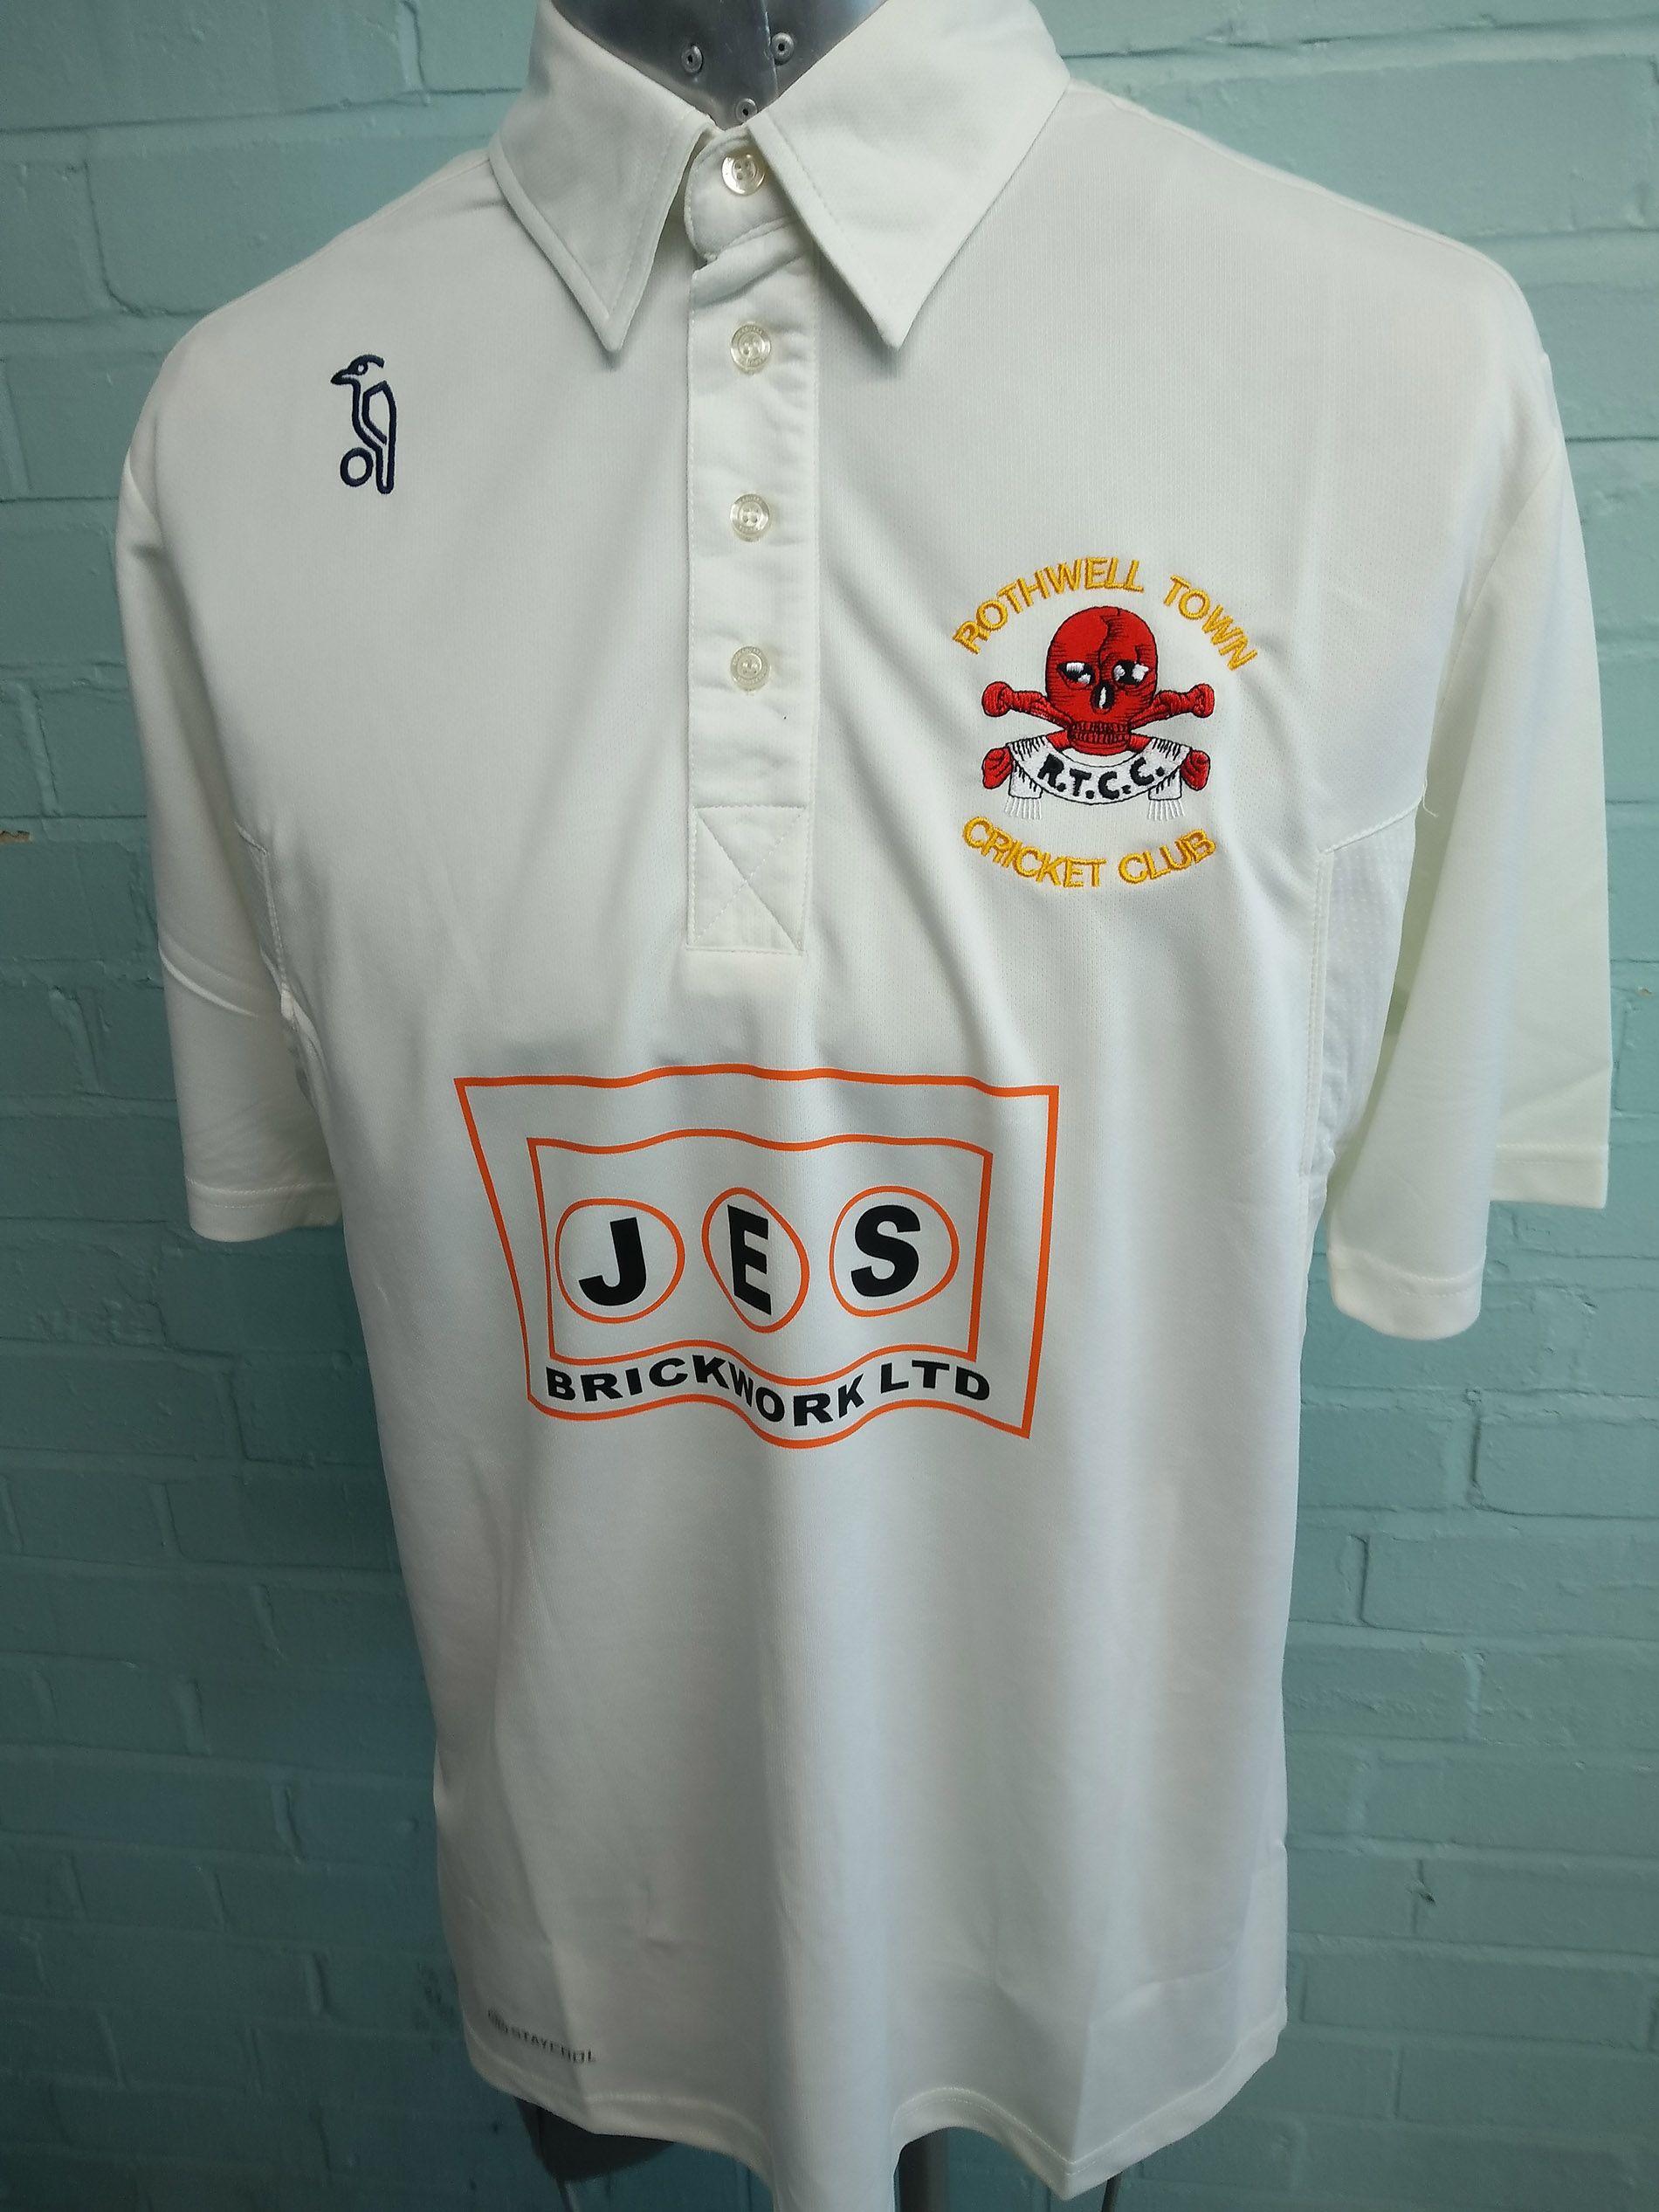 Sports Polo Tees Custom Cricket Shirts For Rothwell Town Cricket